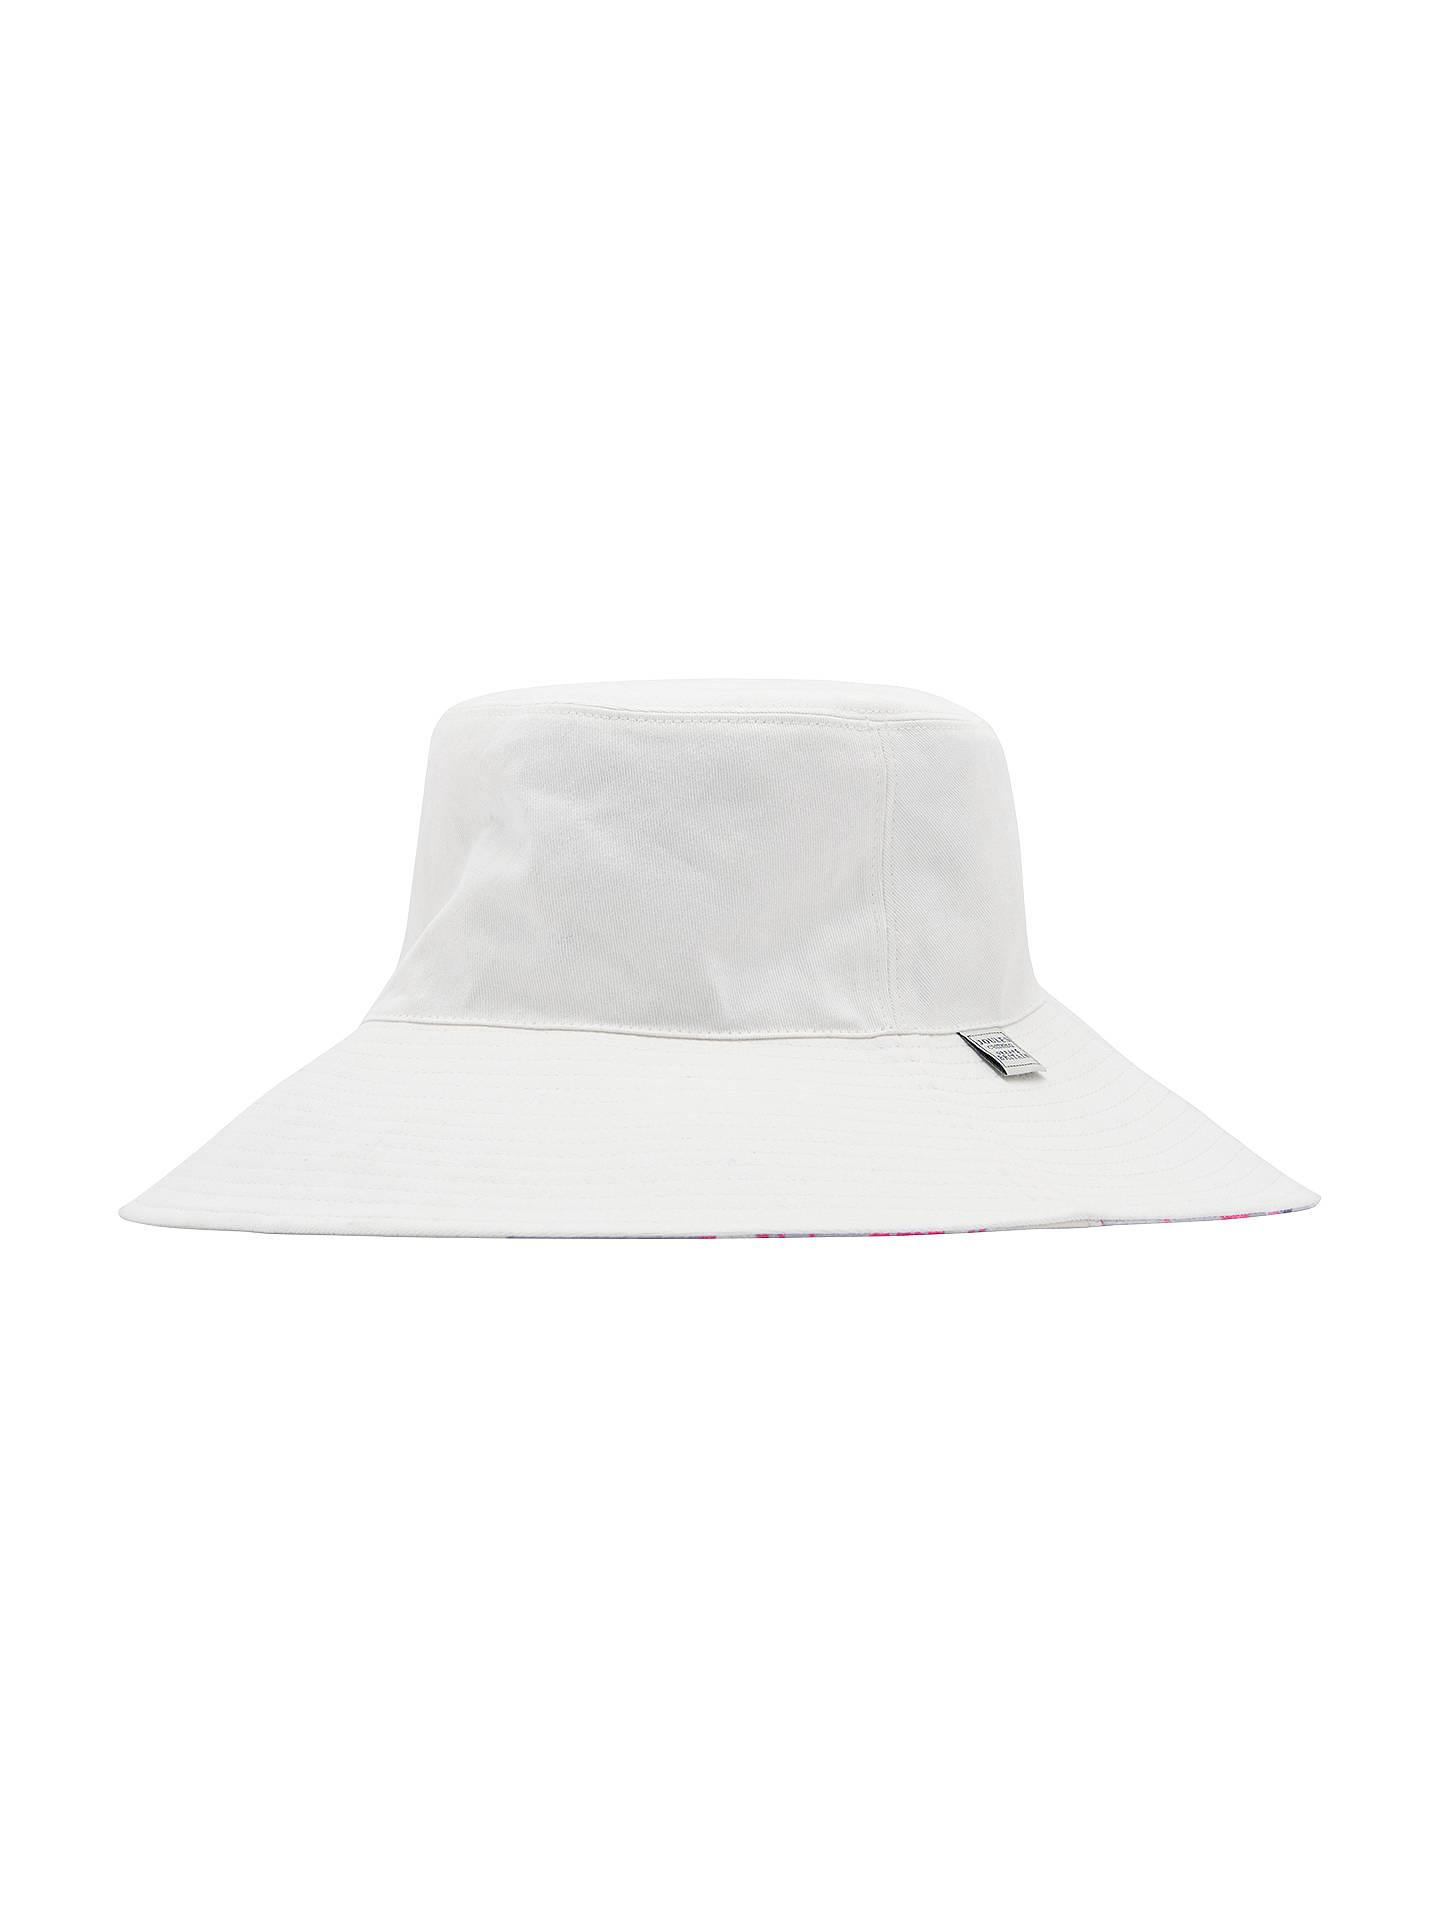 99bc5cda1 Joules Celia Floral Sun Hat, White/Multi at John Lewis & Partners